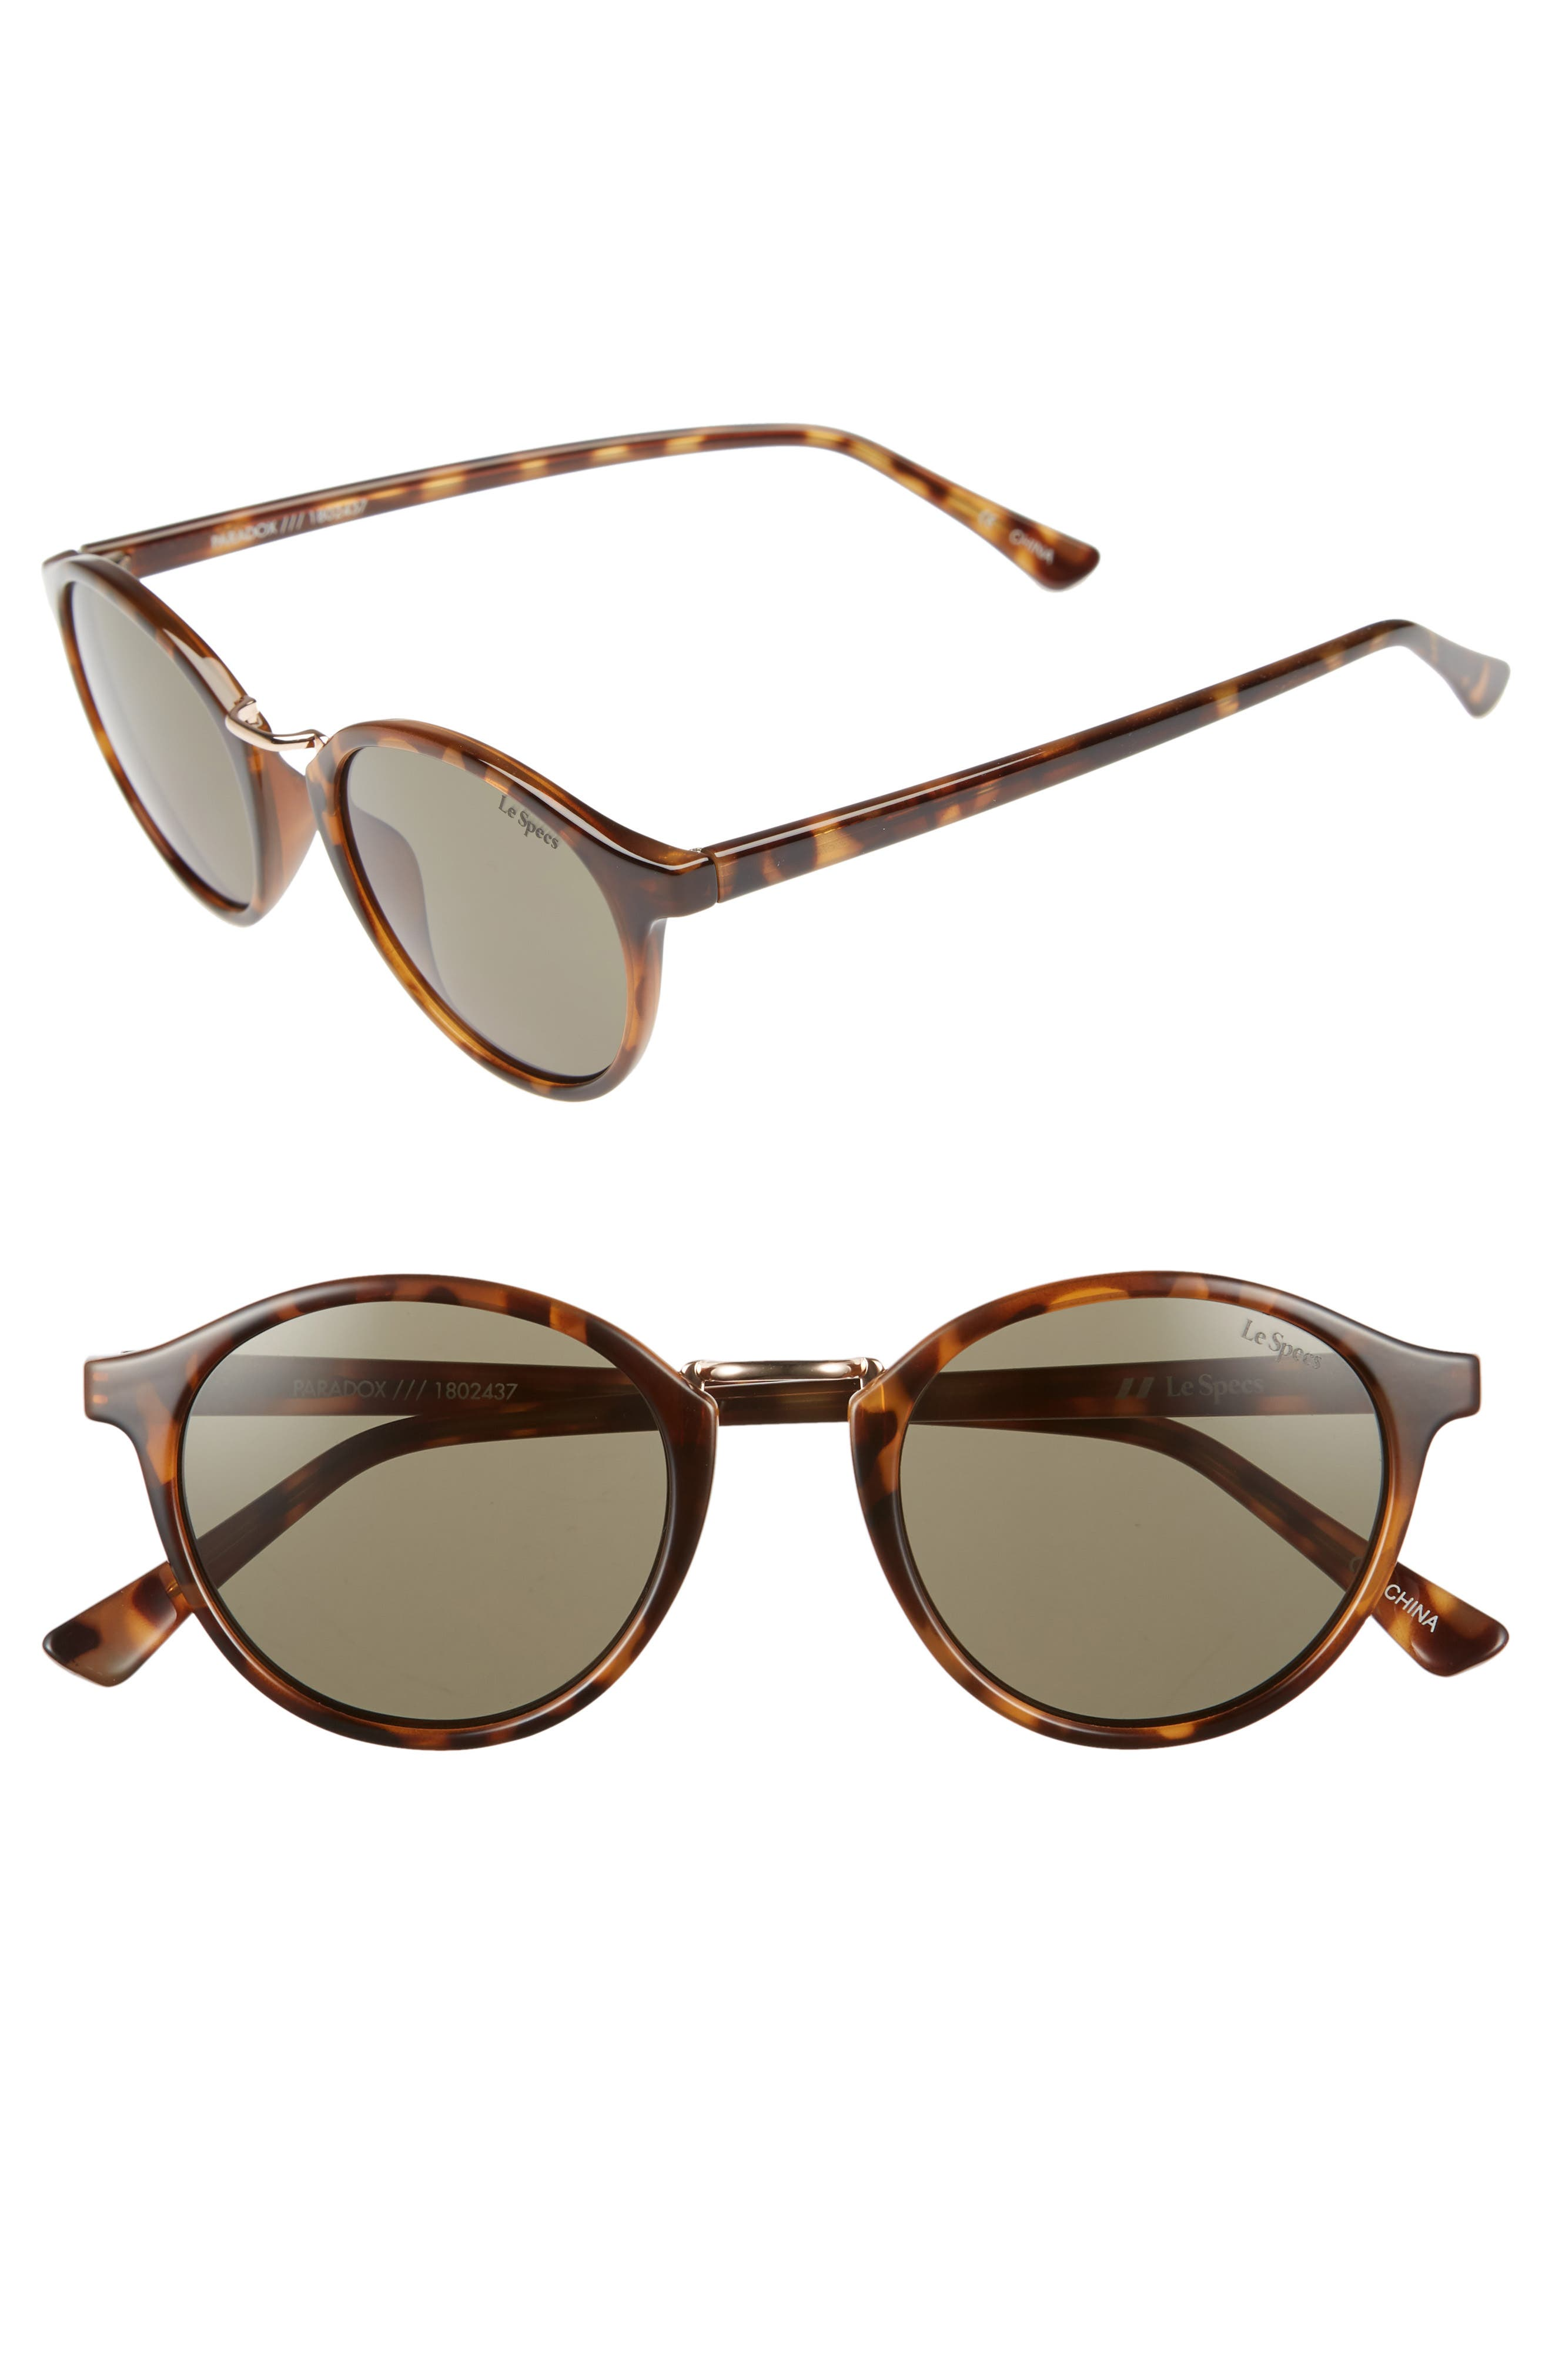 Pardox 49mm Polarized Sunglasses,                         Main,                         color, 200